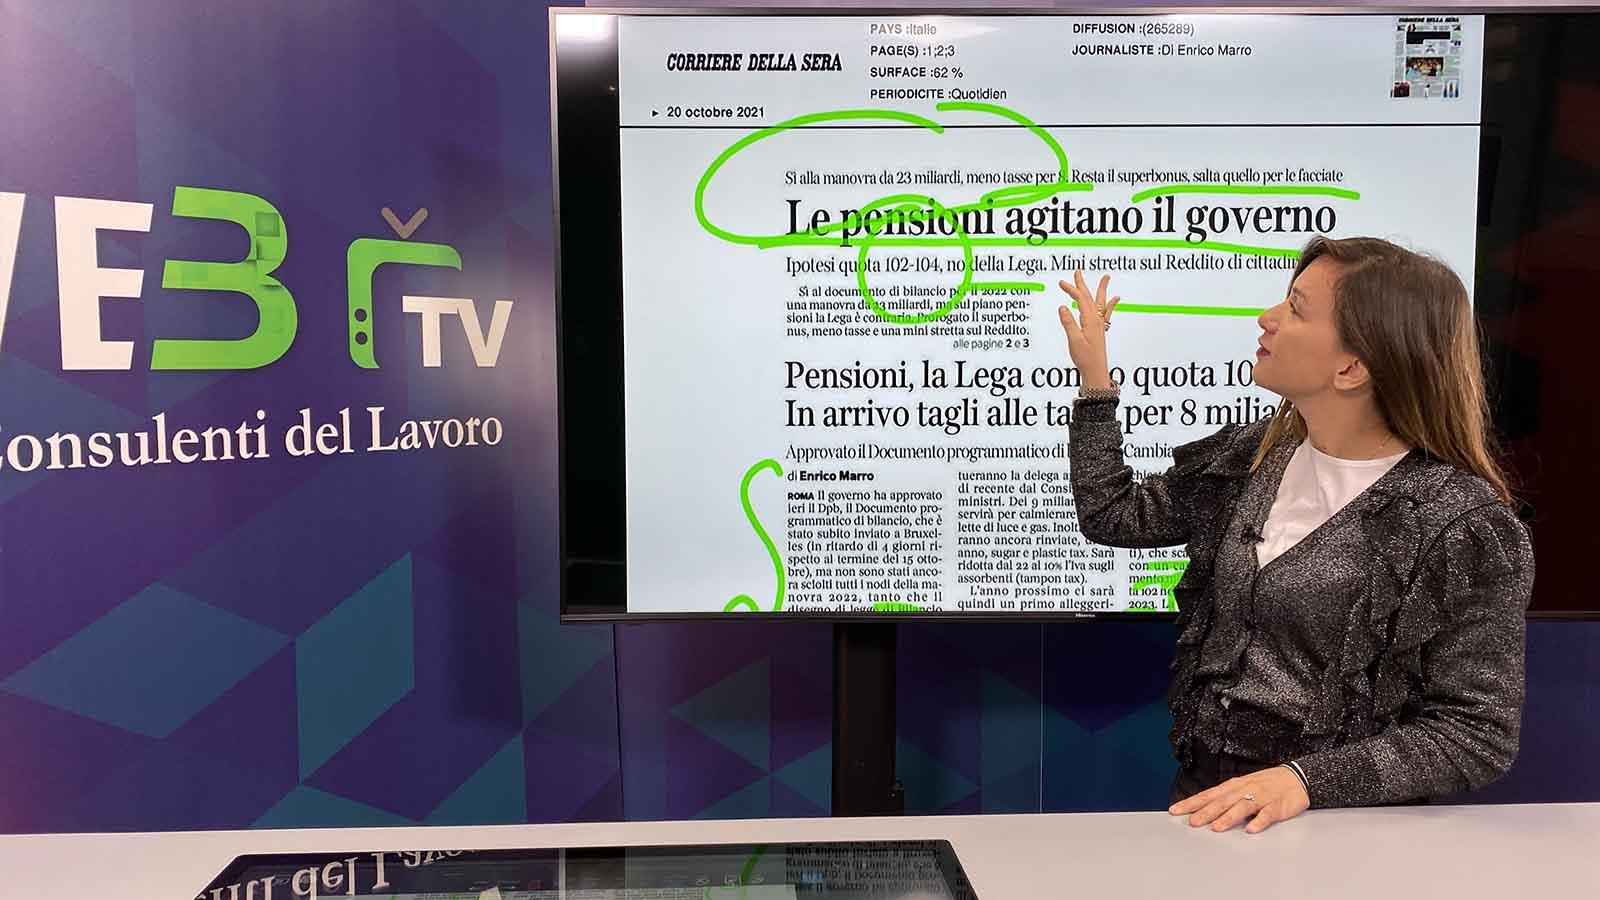 Rassegna Stampa - 20.10.2021